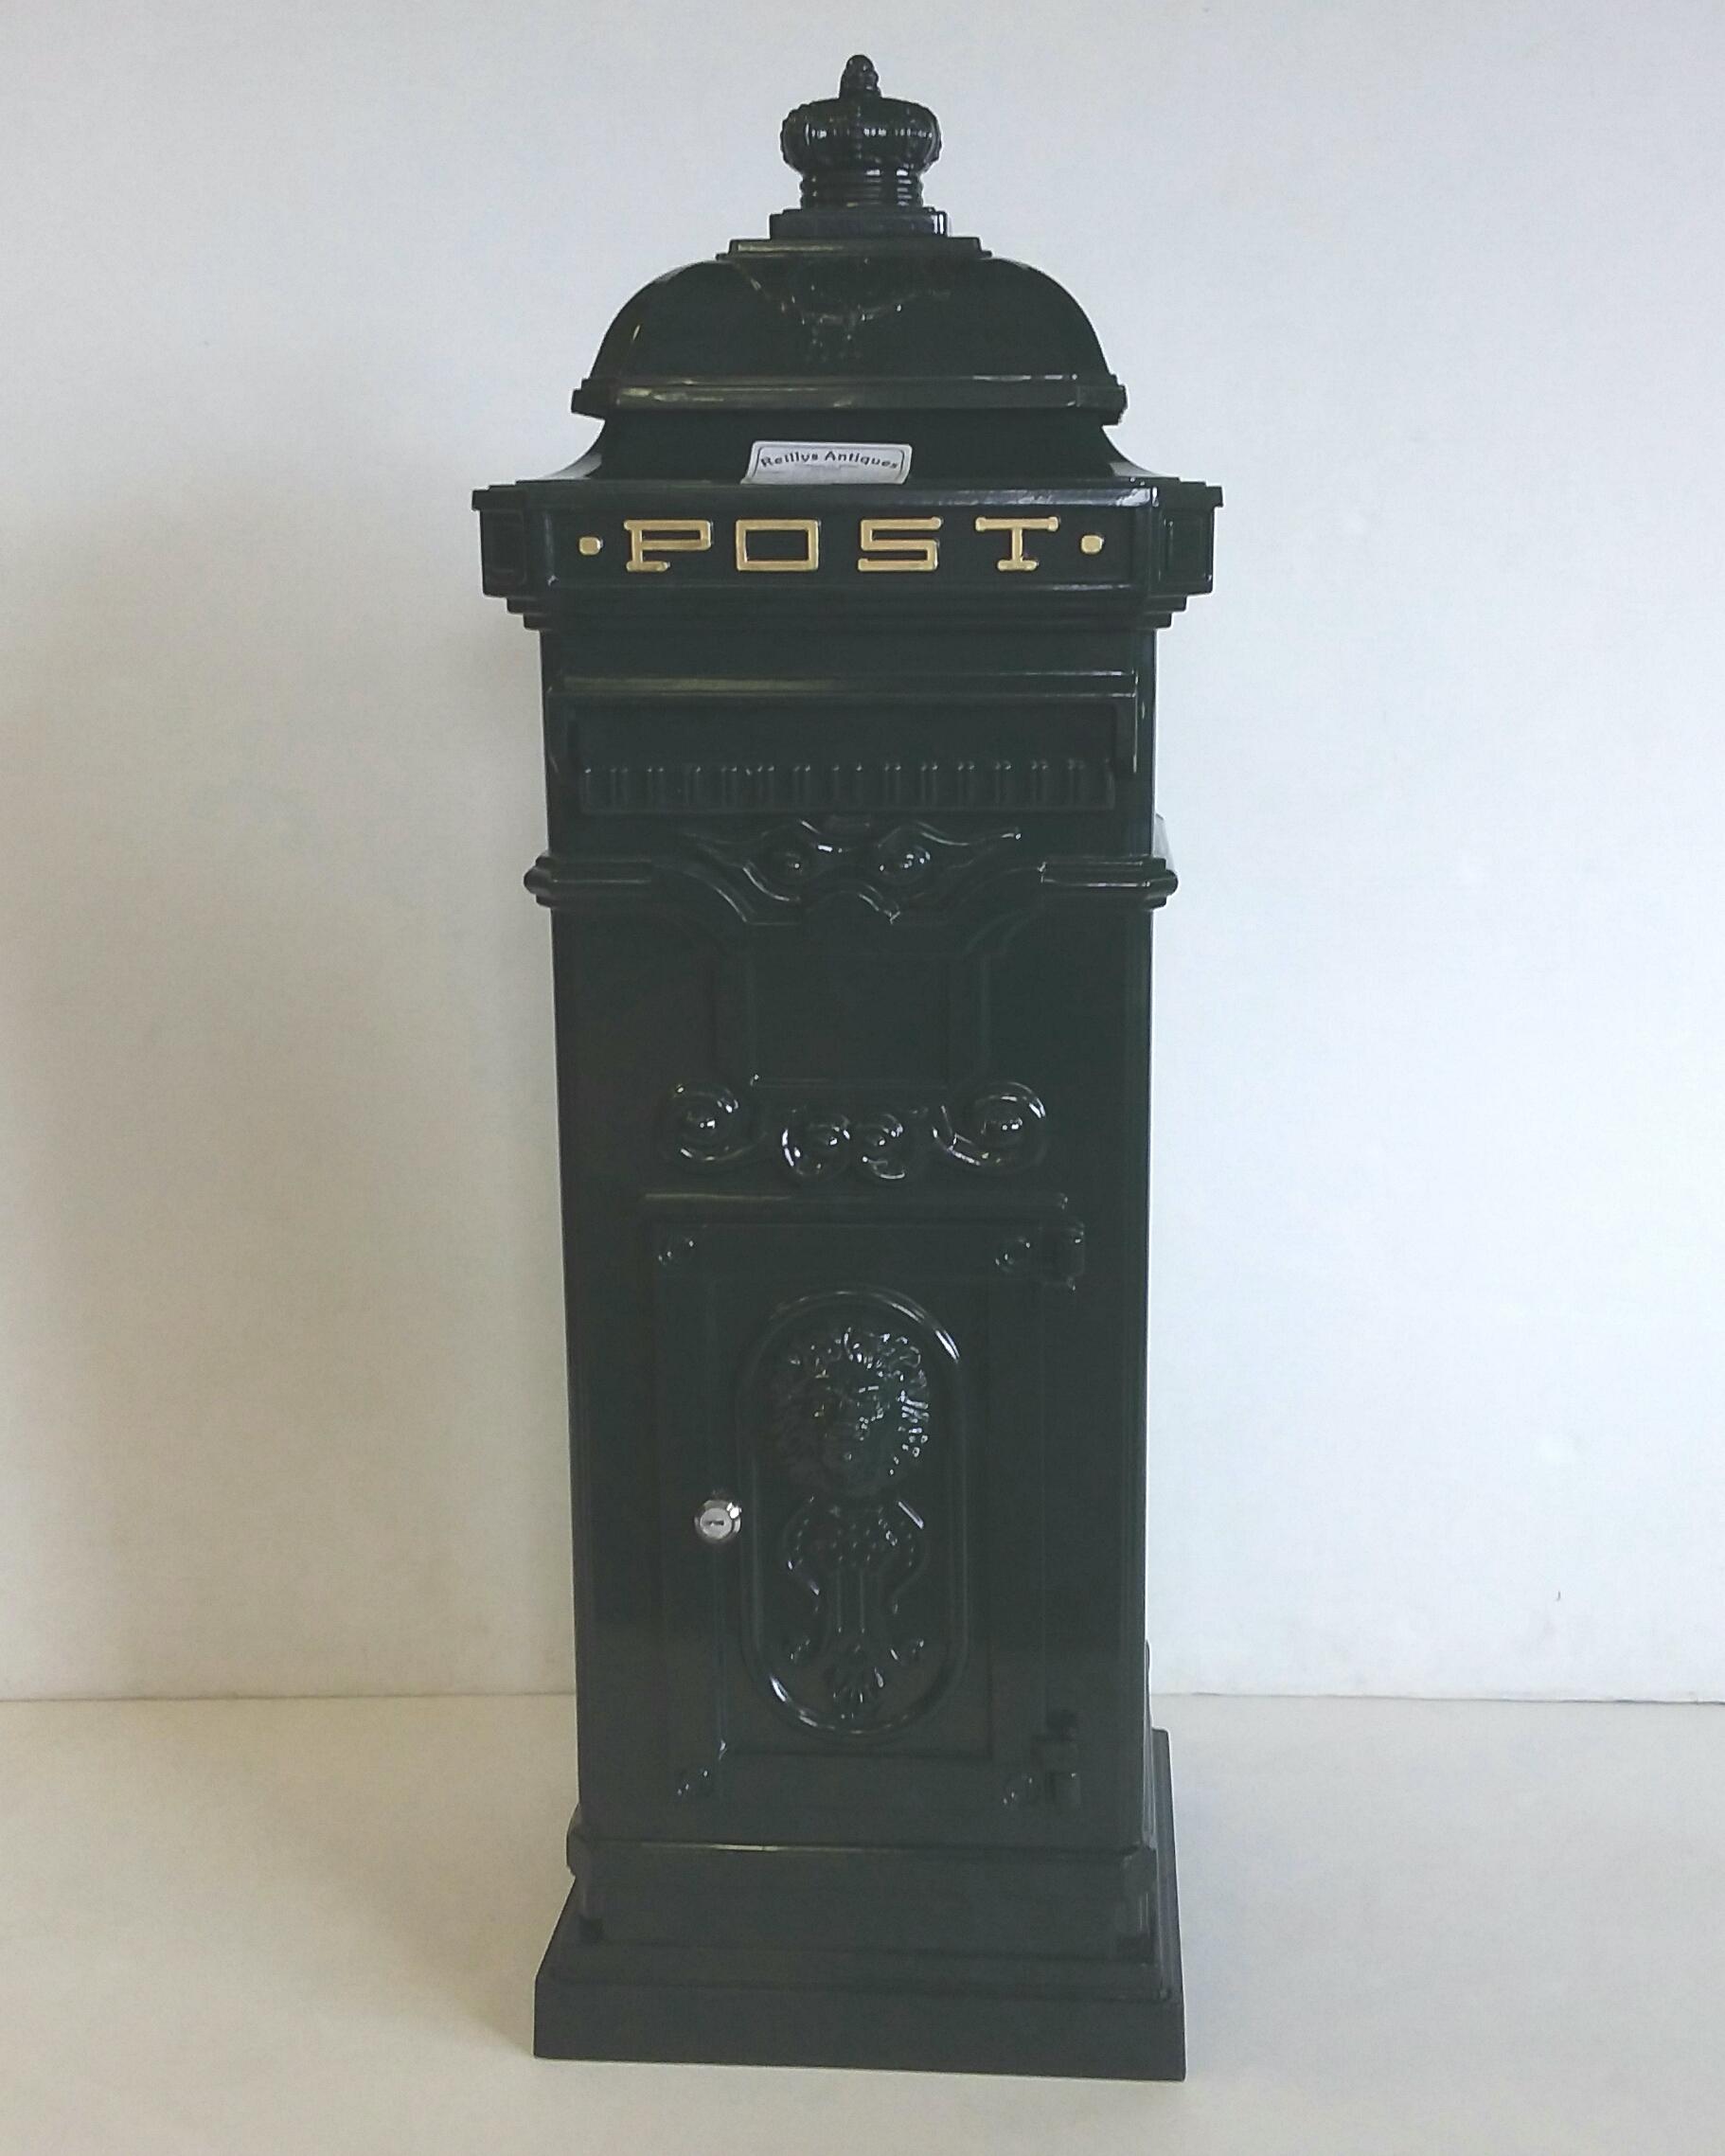 Aluminium Mail Box : Aluminium mail box green reilly antiques